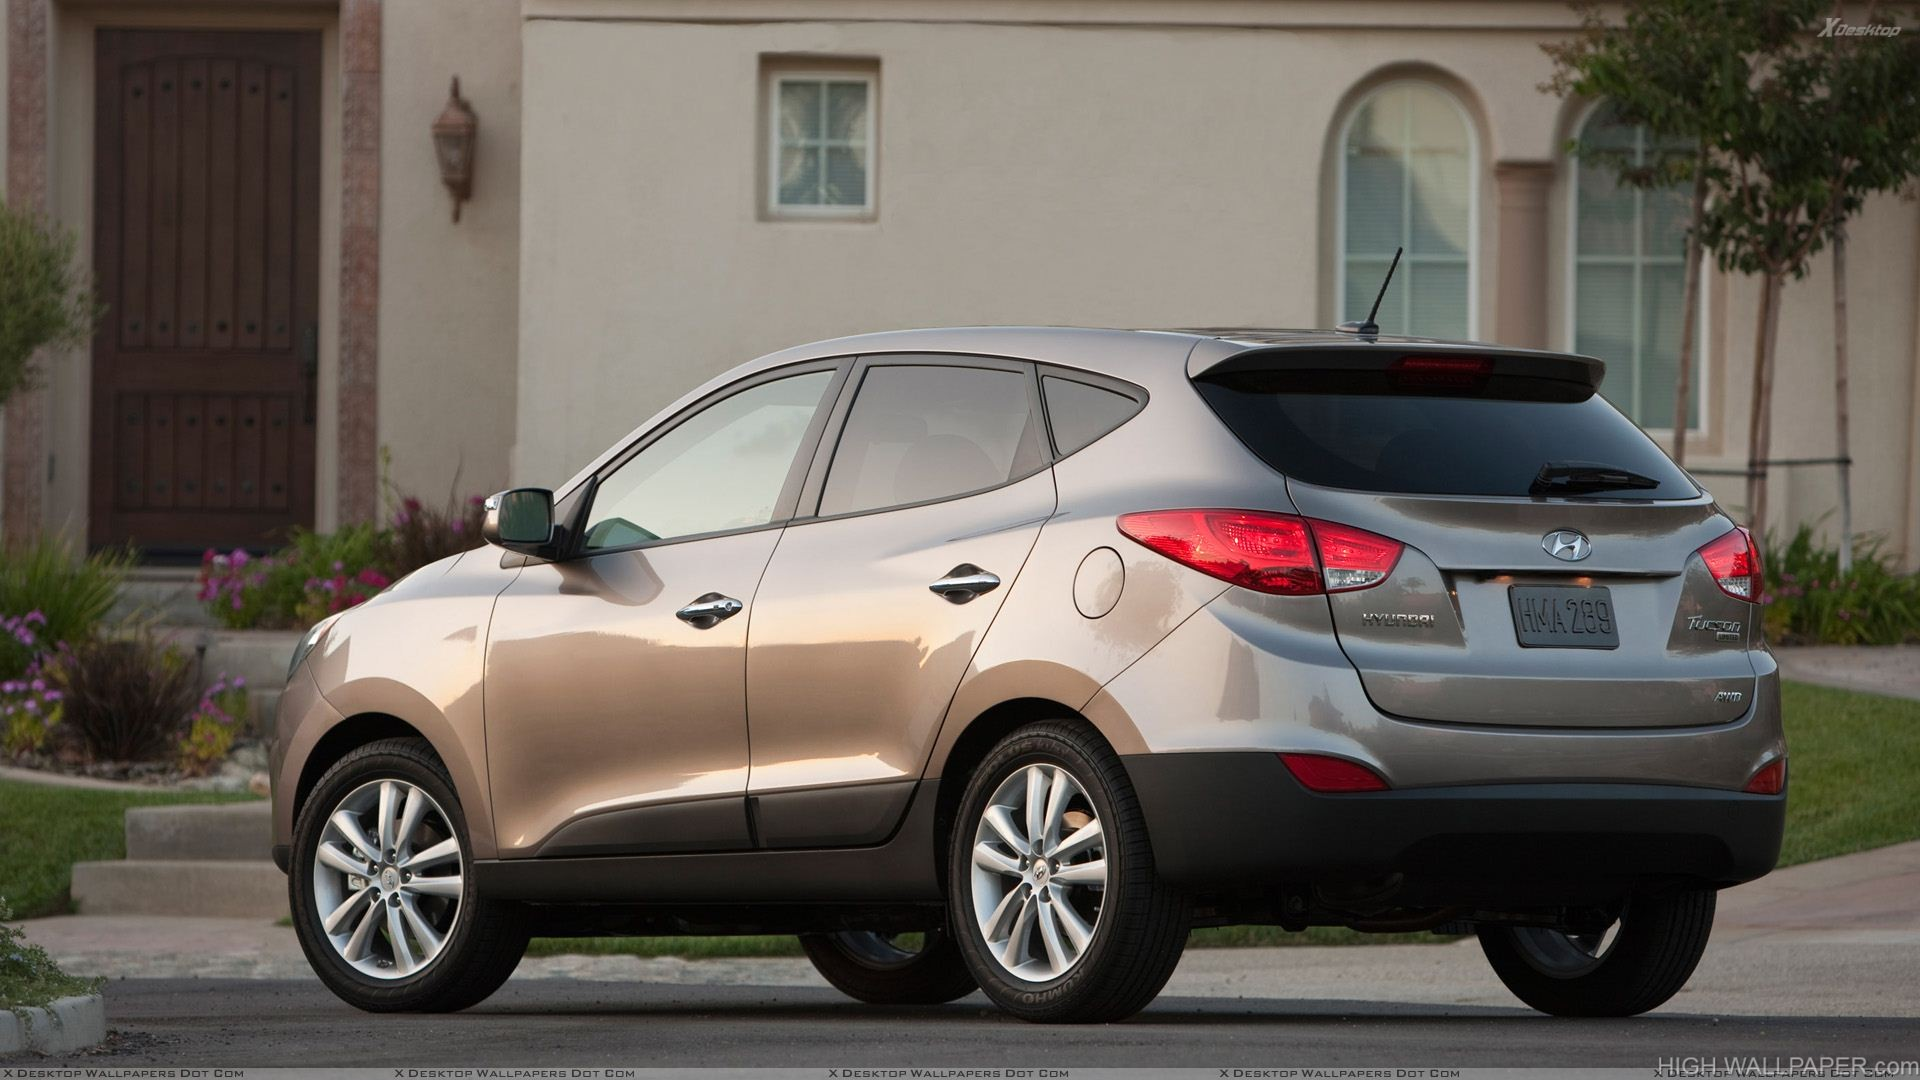 Hyundai Tucson Side Rear View